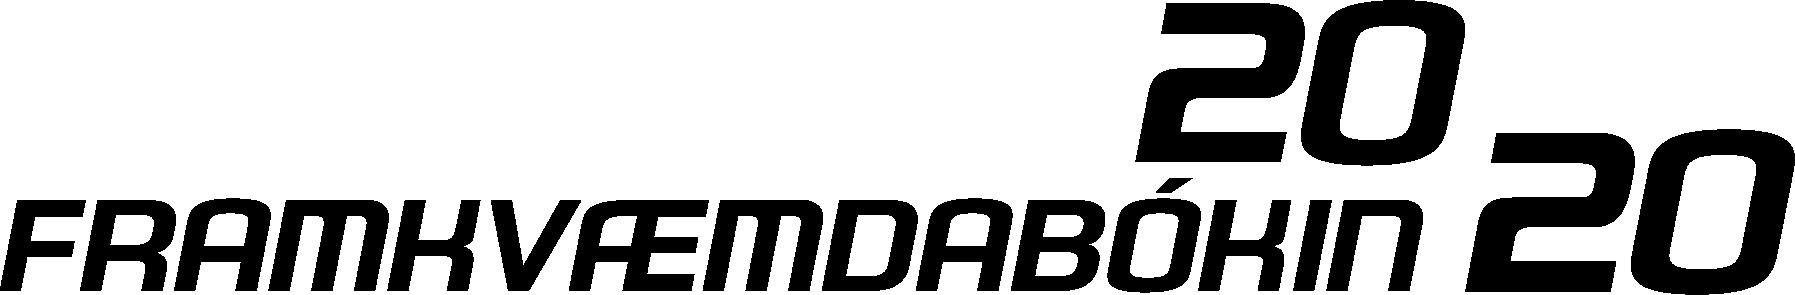 Framkvæmdabókin